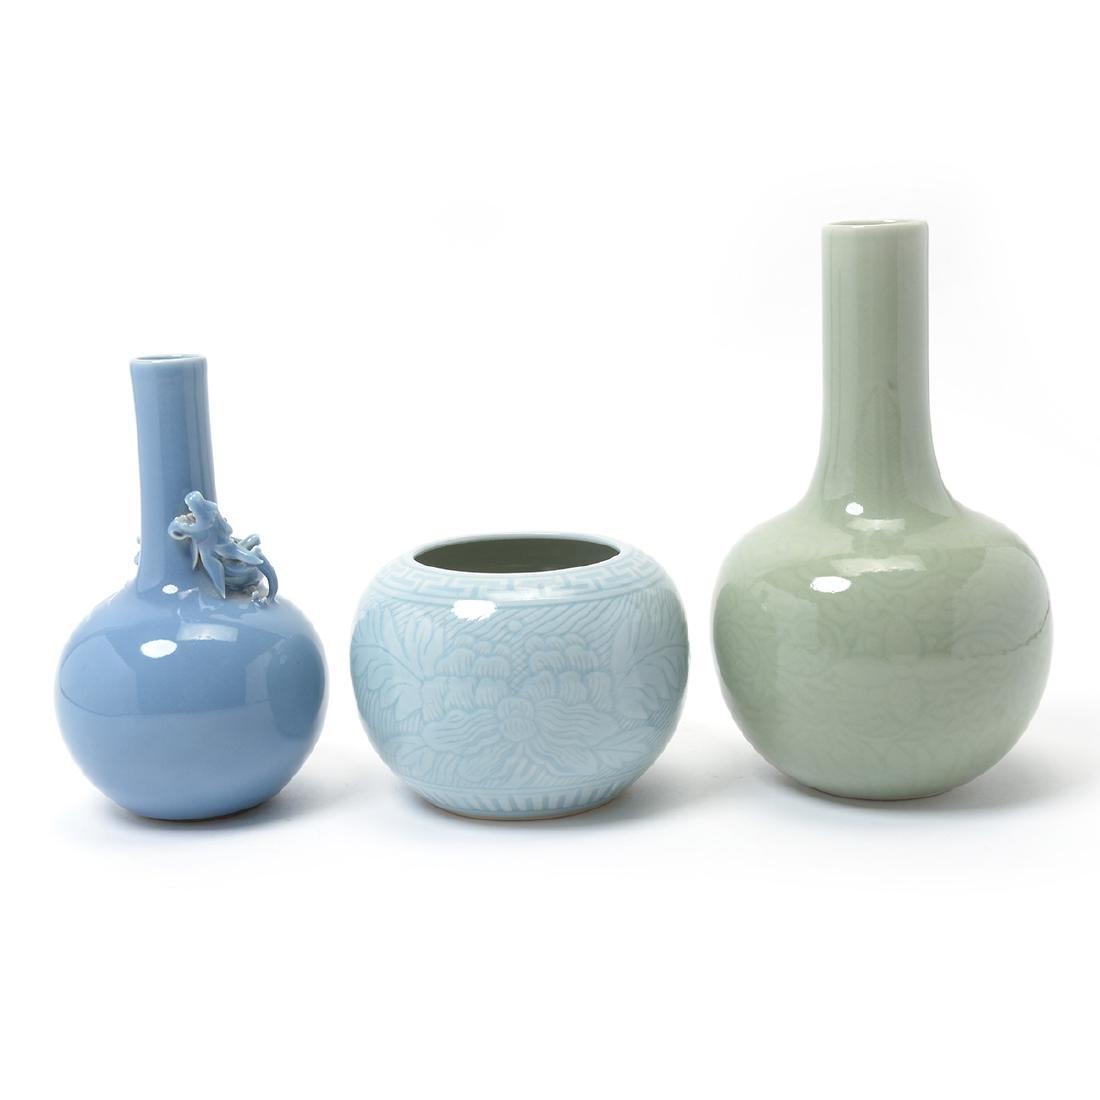 Three Glazed Porcelains